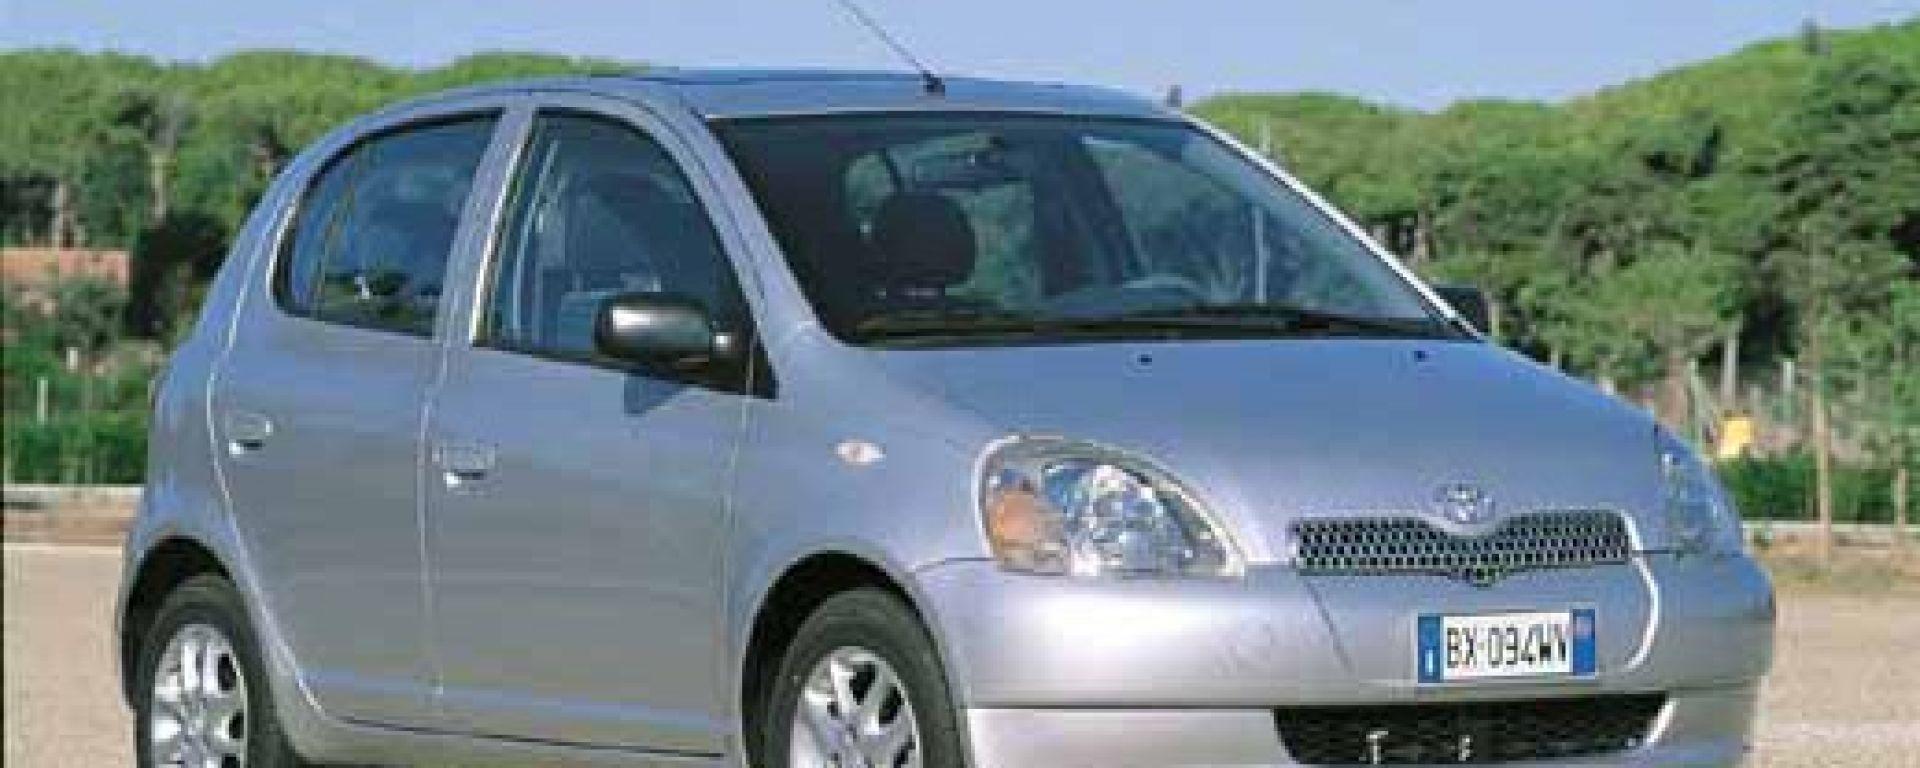 Toyota Yaris my 2003